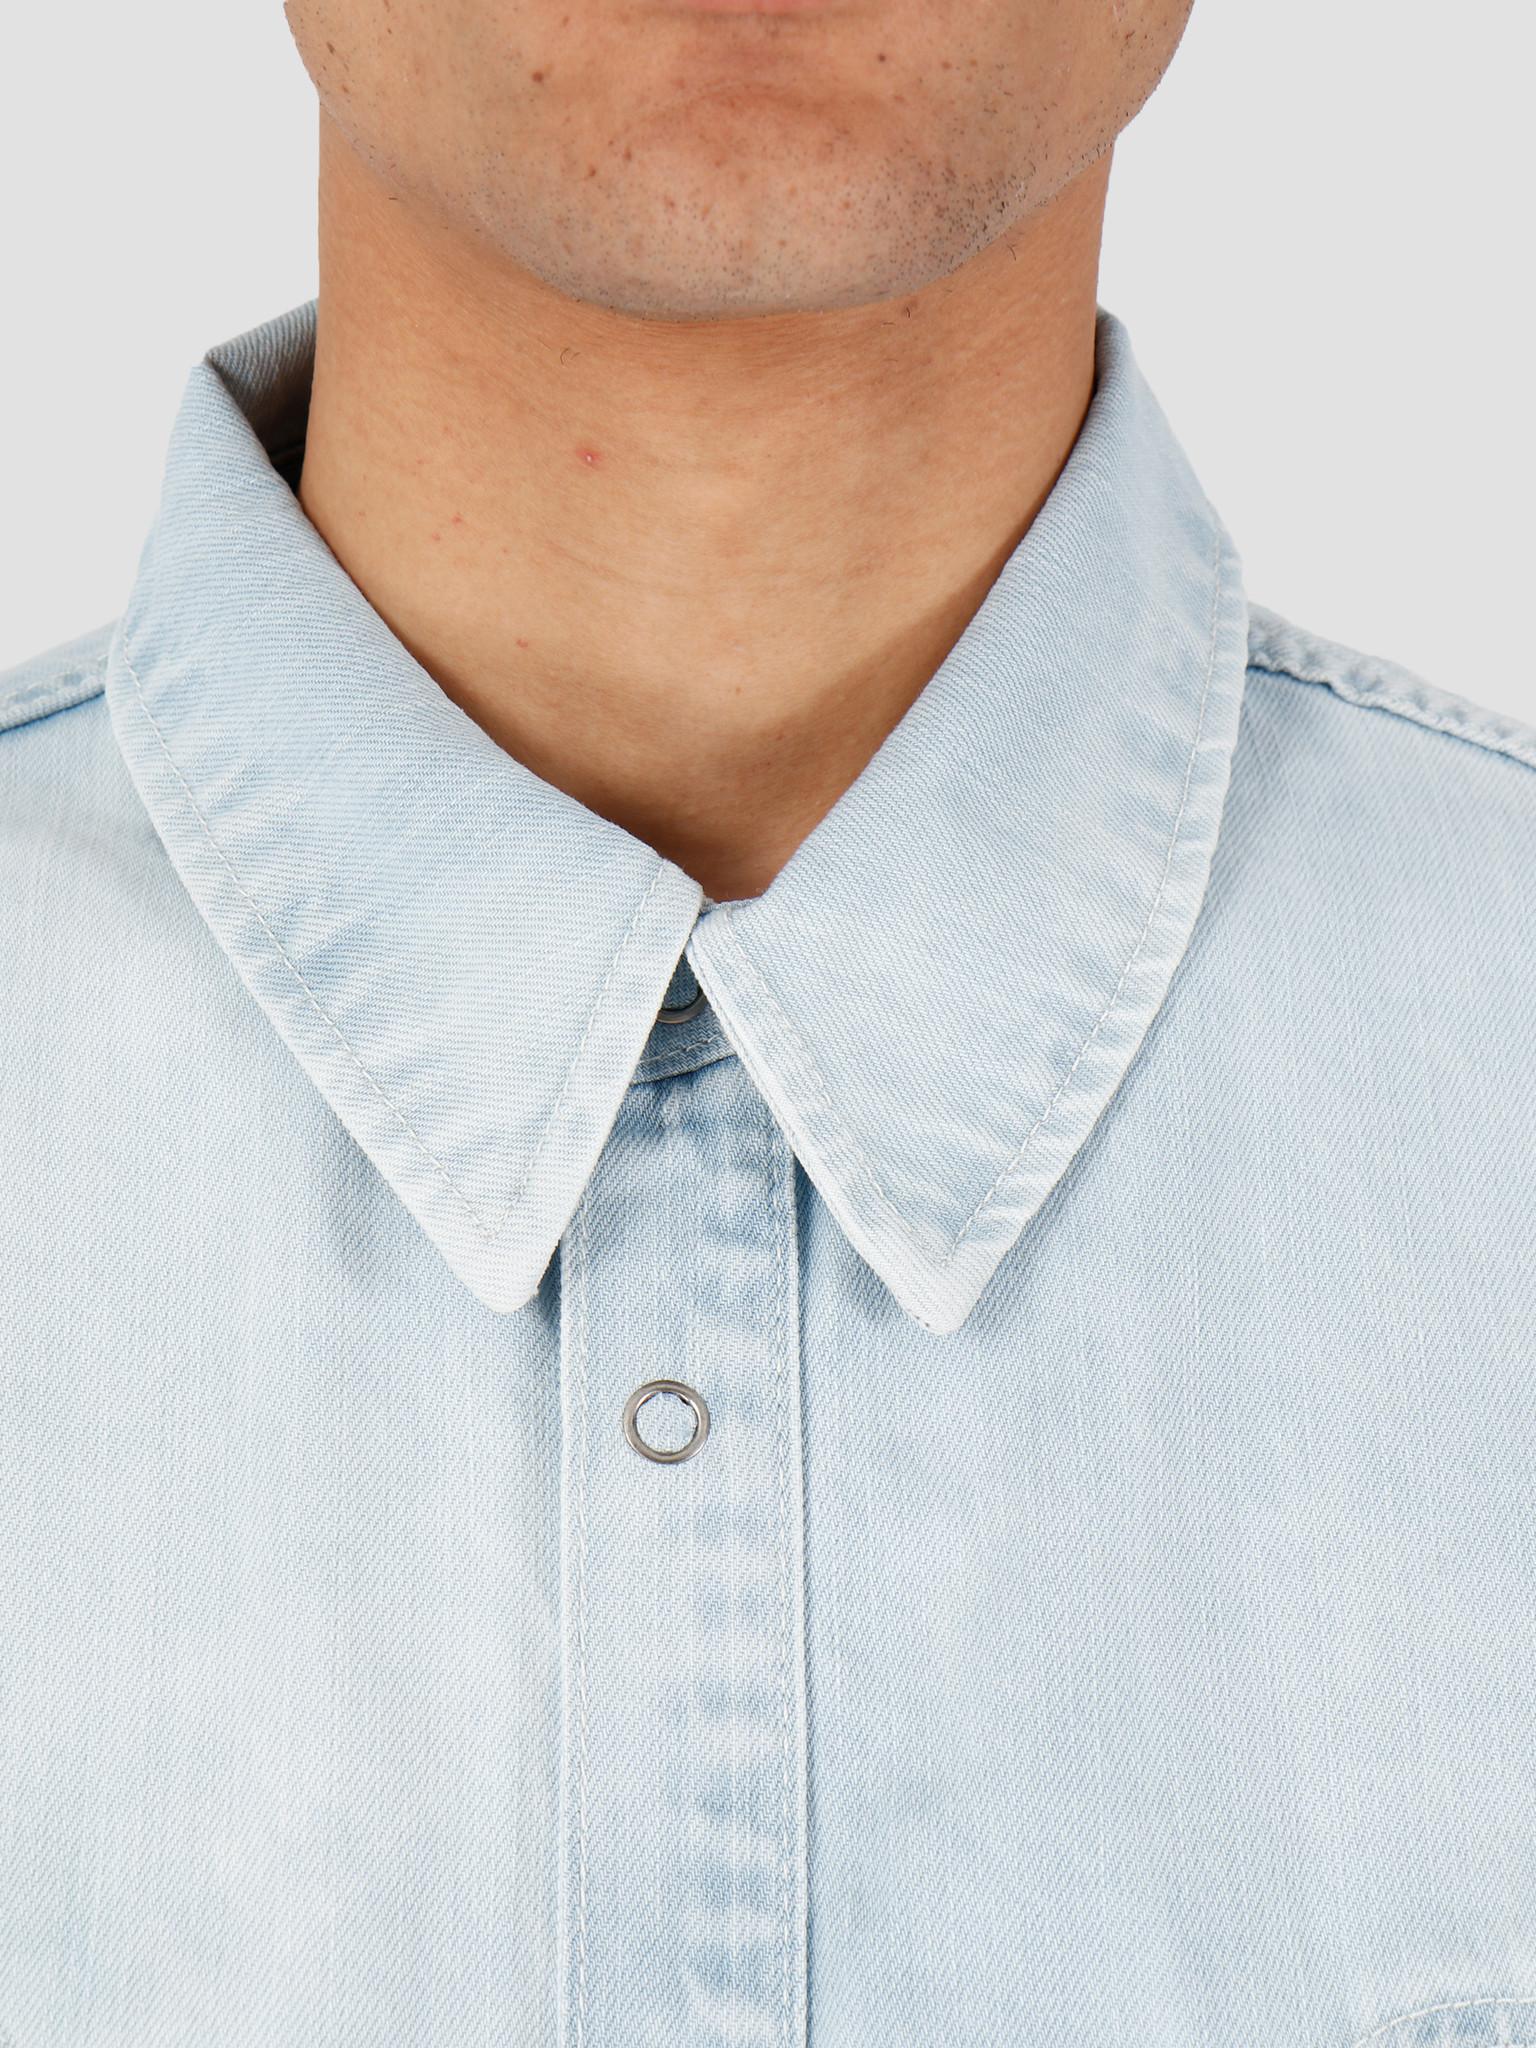 Daily Paper Daily Paper Howboy 2 Shirt Bleach Denim 20S1SH09-01